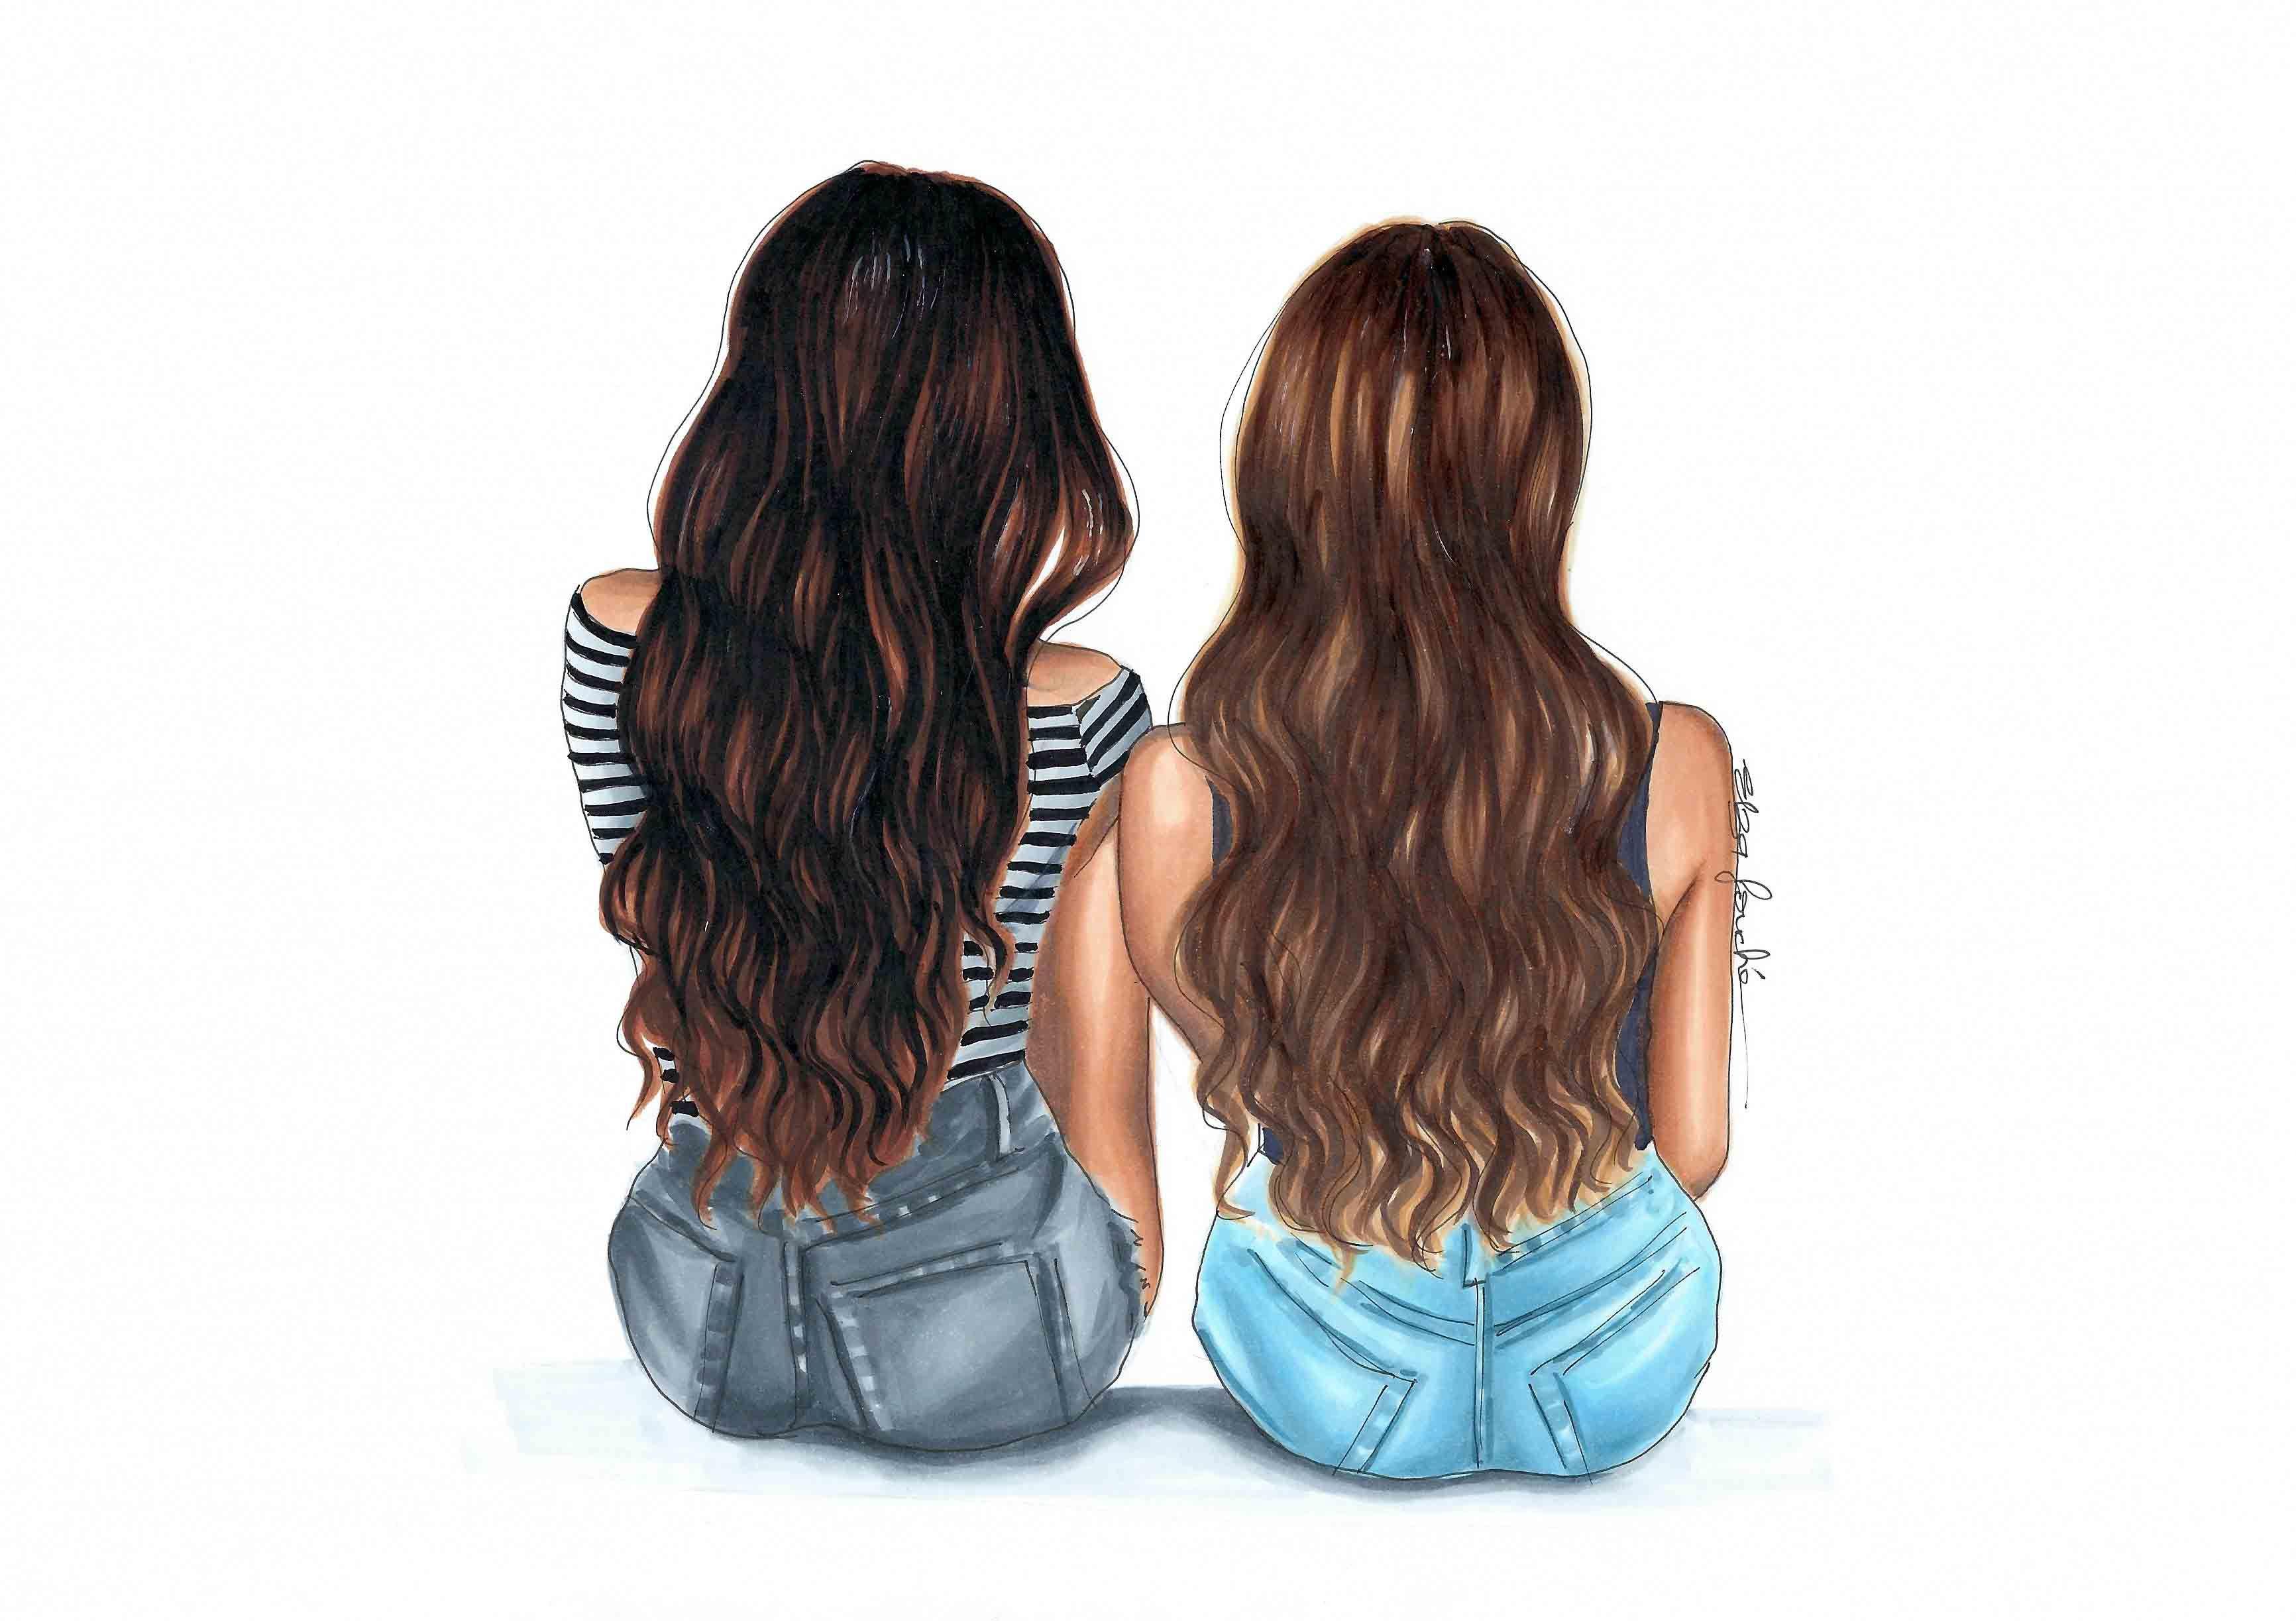 Elzafoucheartist Best Friend Drawings Drawings Of Friends Friends Illustration